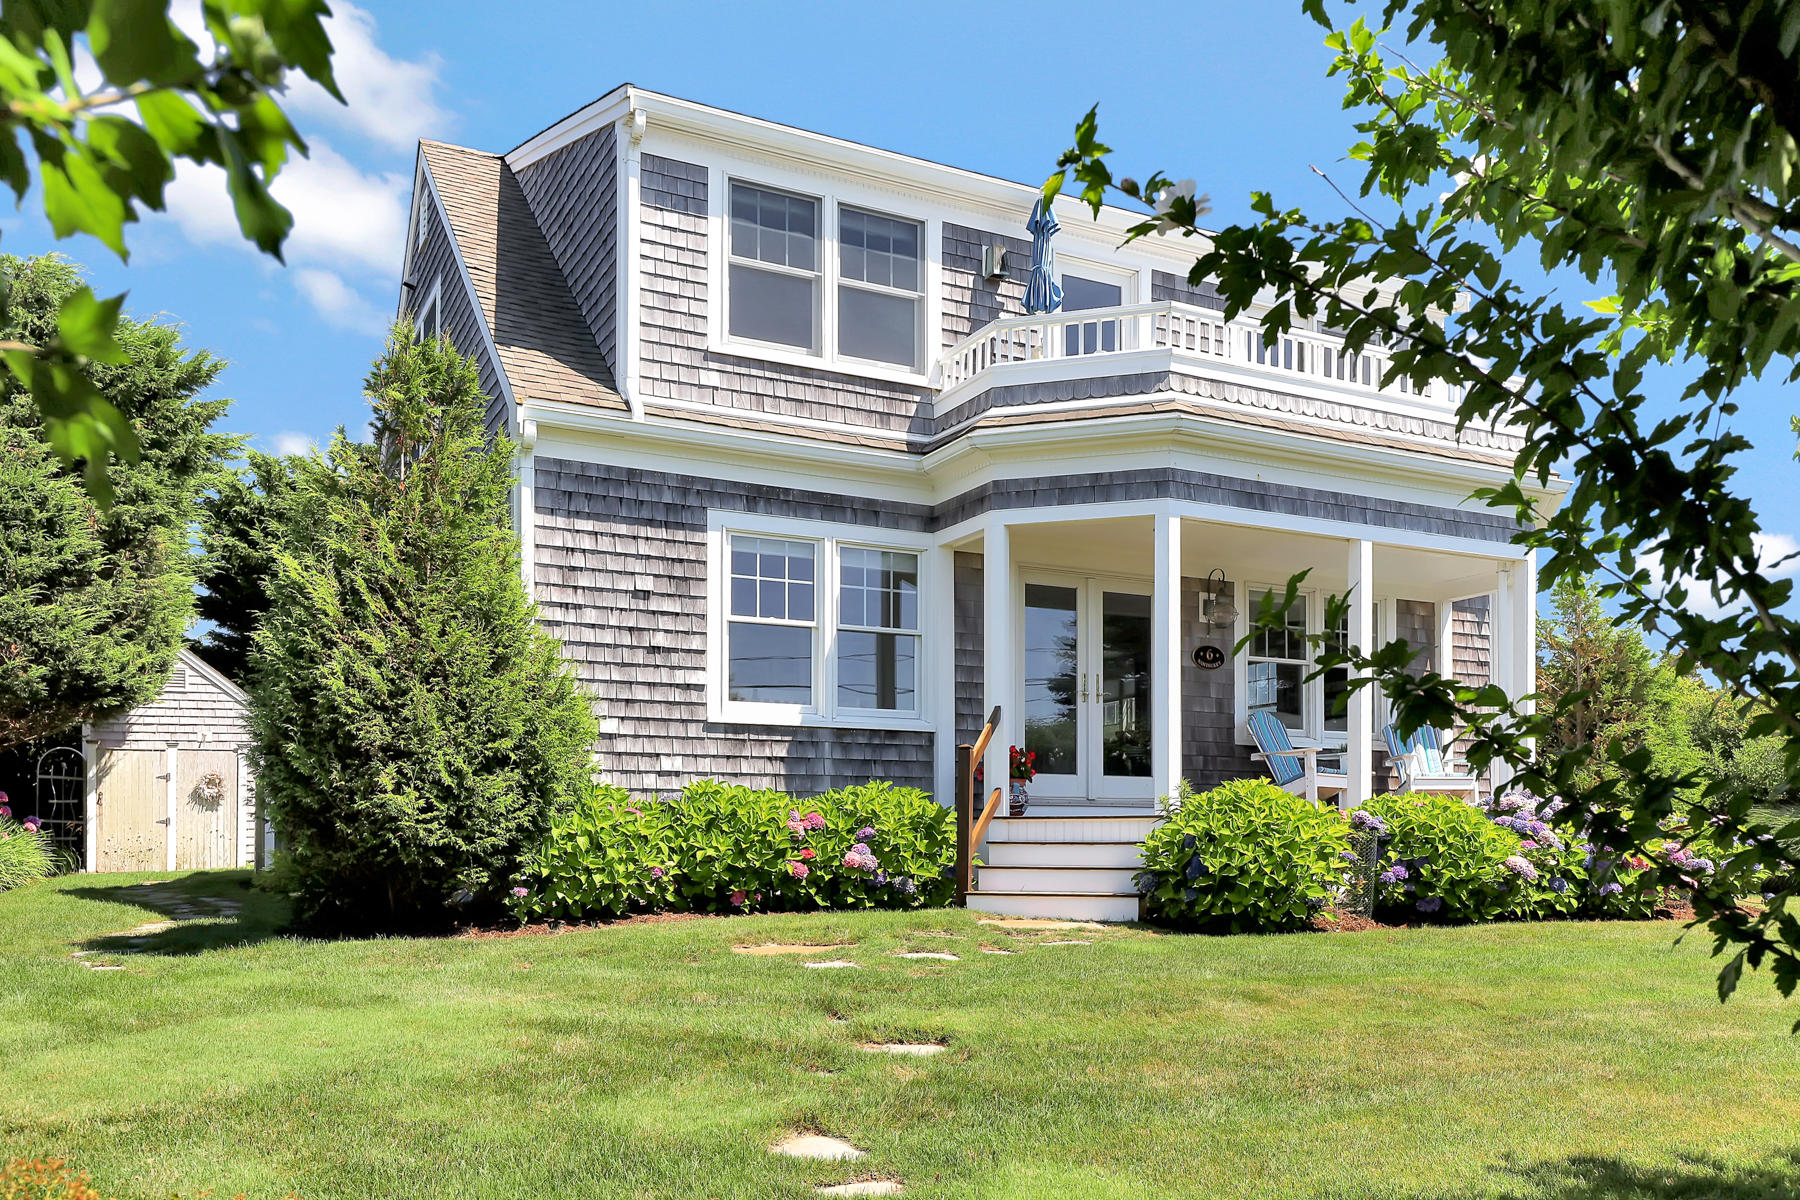 6 Nantucket Drive, Chatham MA, 02633 sales details